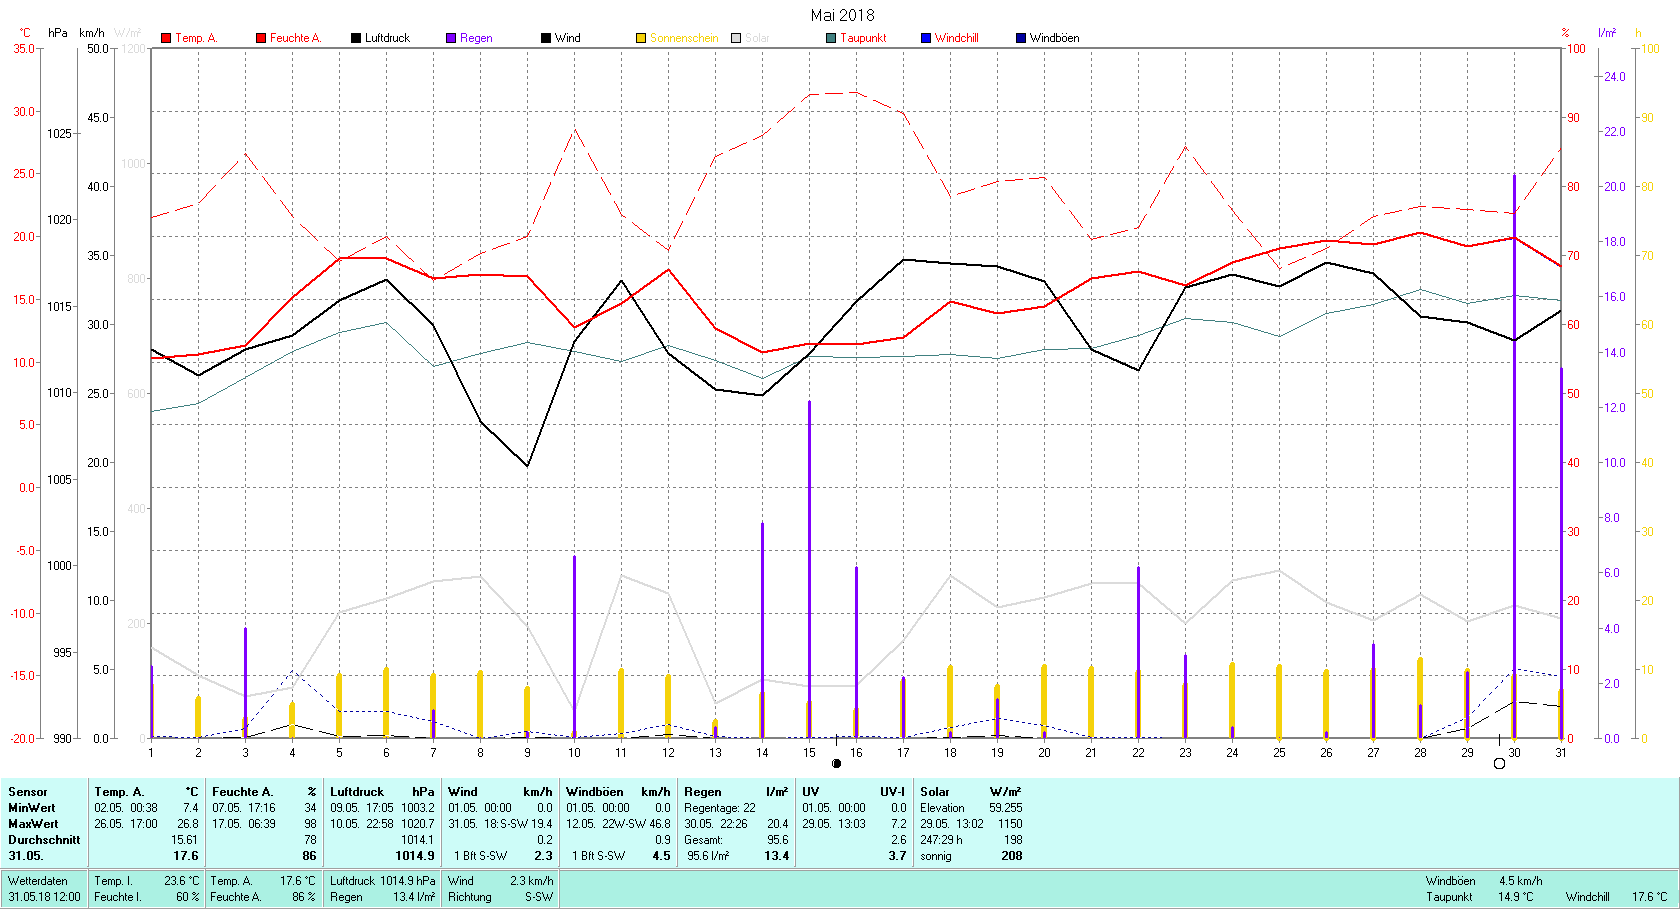 Mai 2018 Tmin 7.4°C, Tmax 26.8°C, Sonne 247:29 h, Niederschlag 95.6mm/2